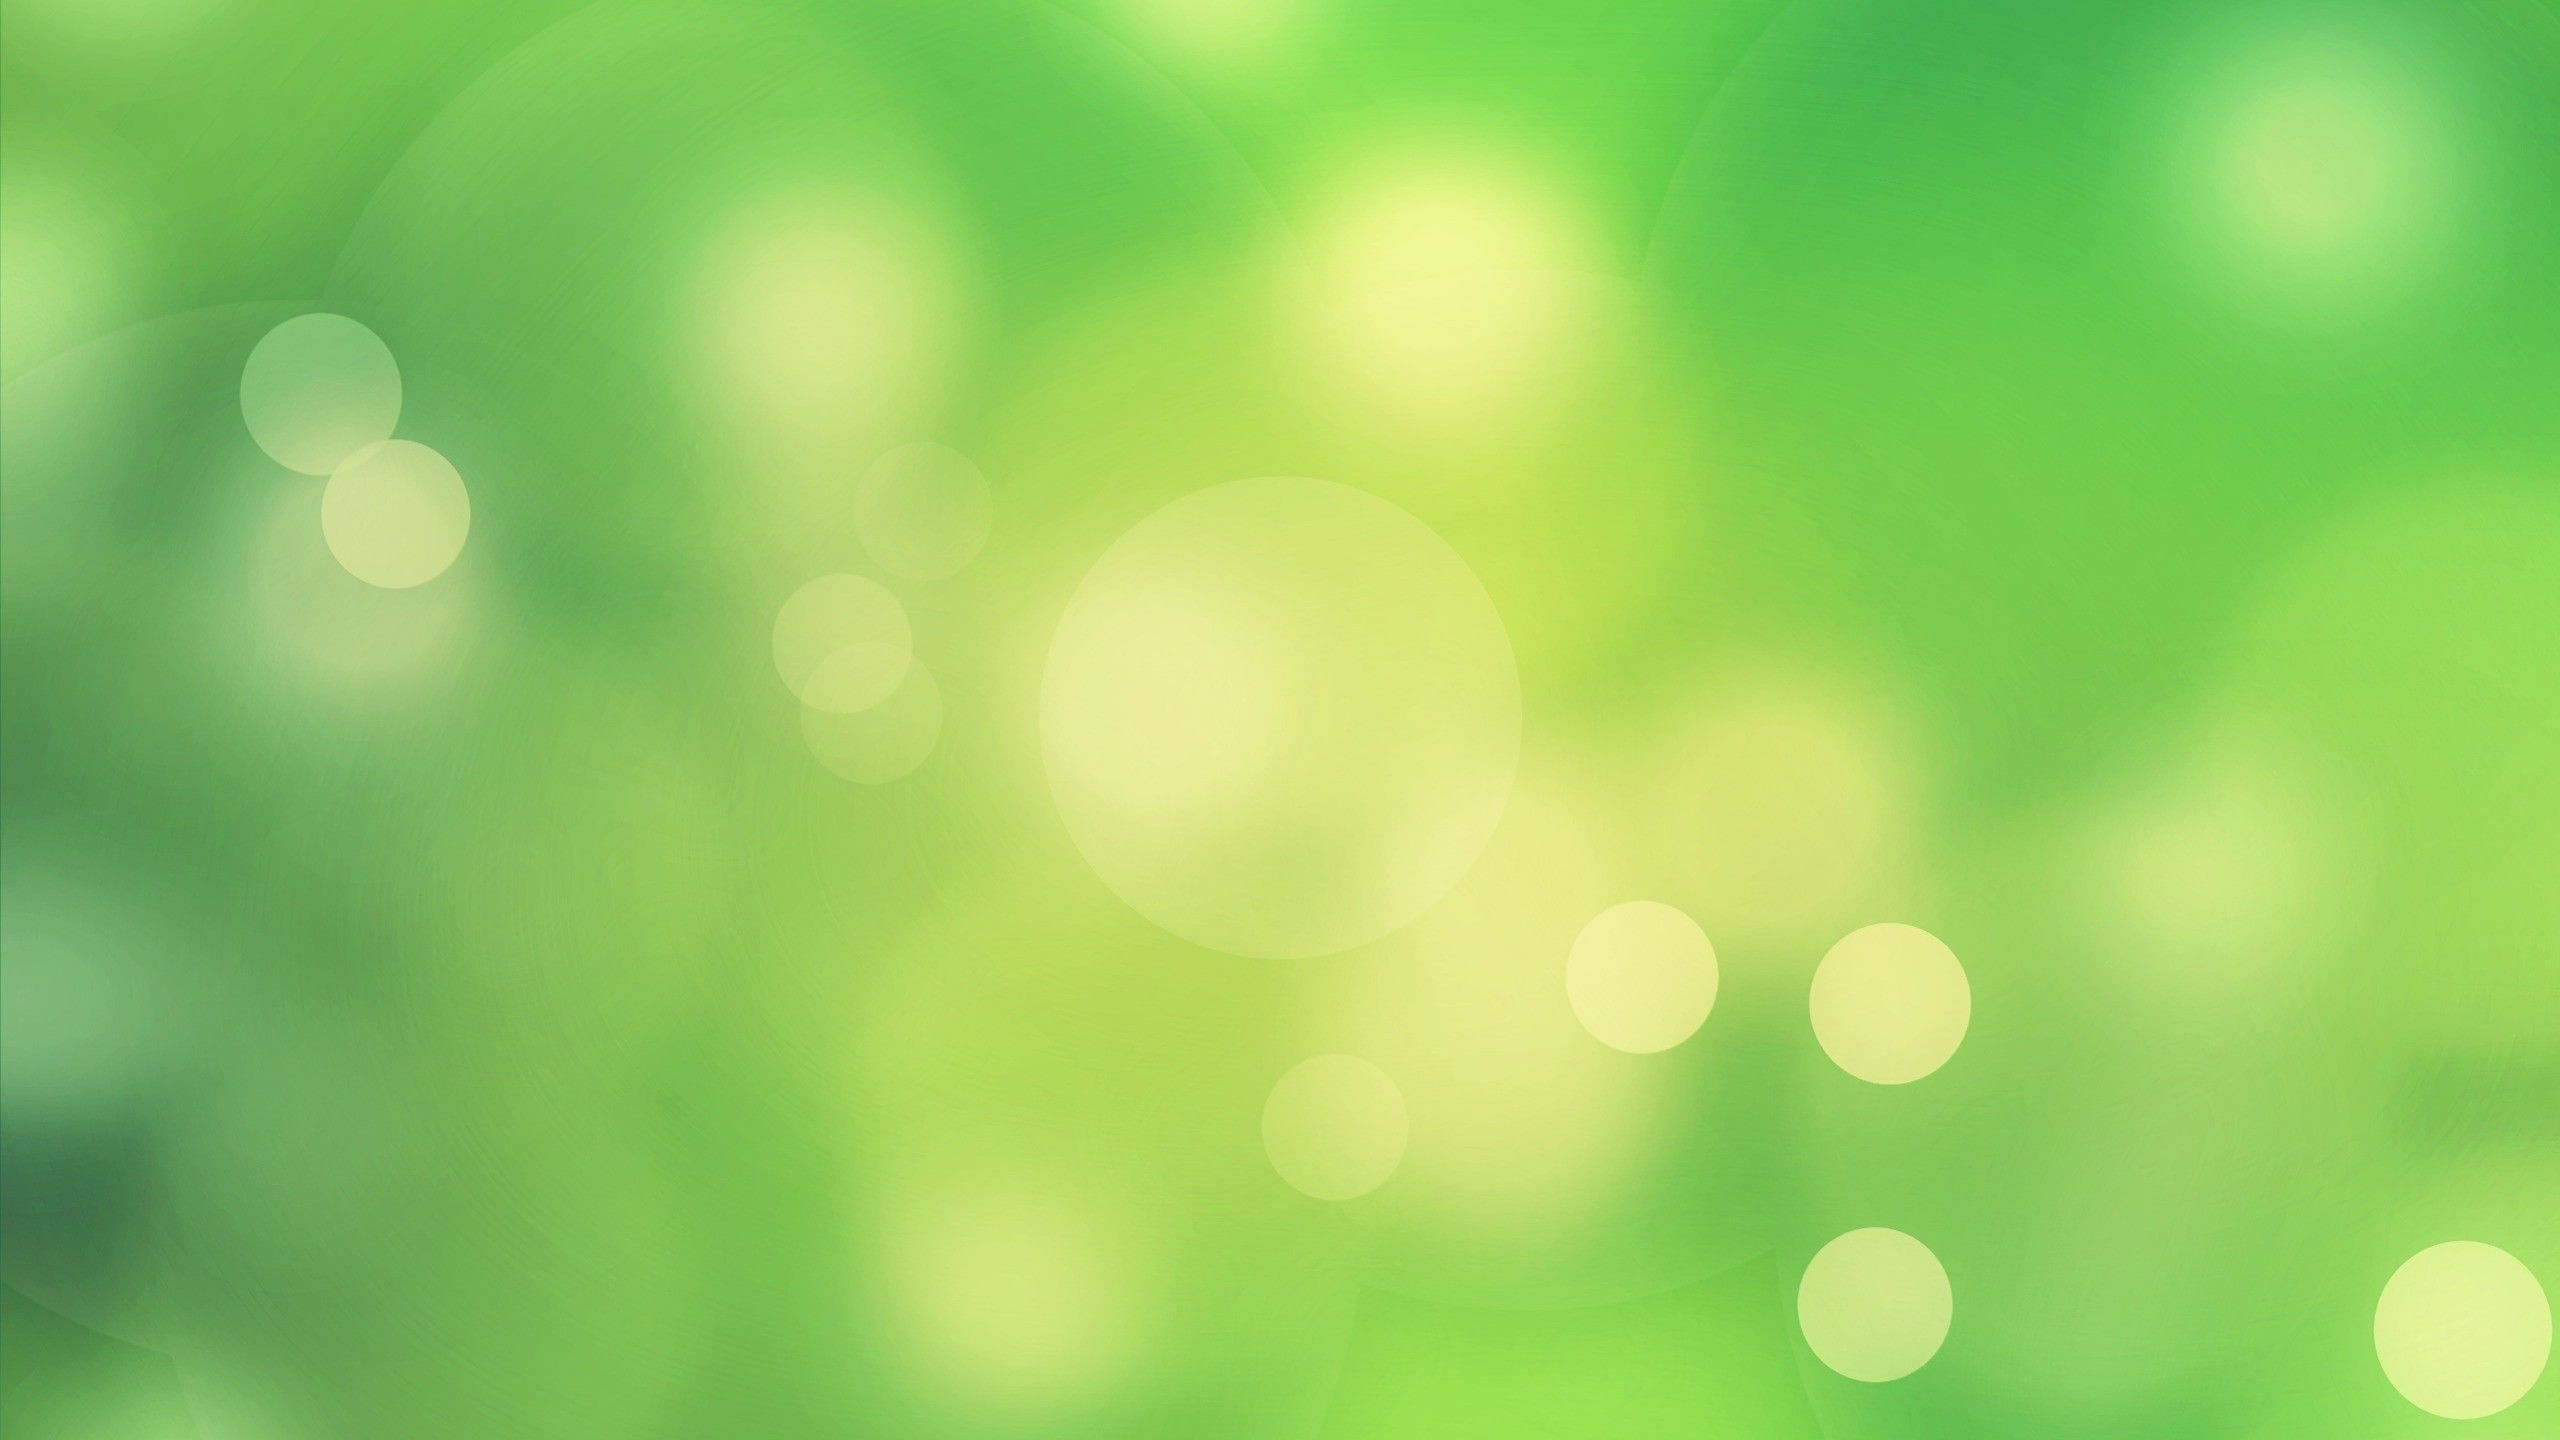 Green Wallpaper My Blog In 2019 Green Wallpaper Green